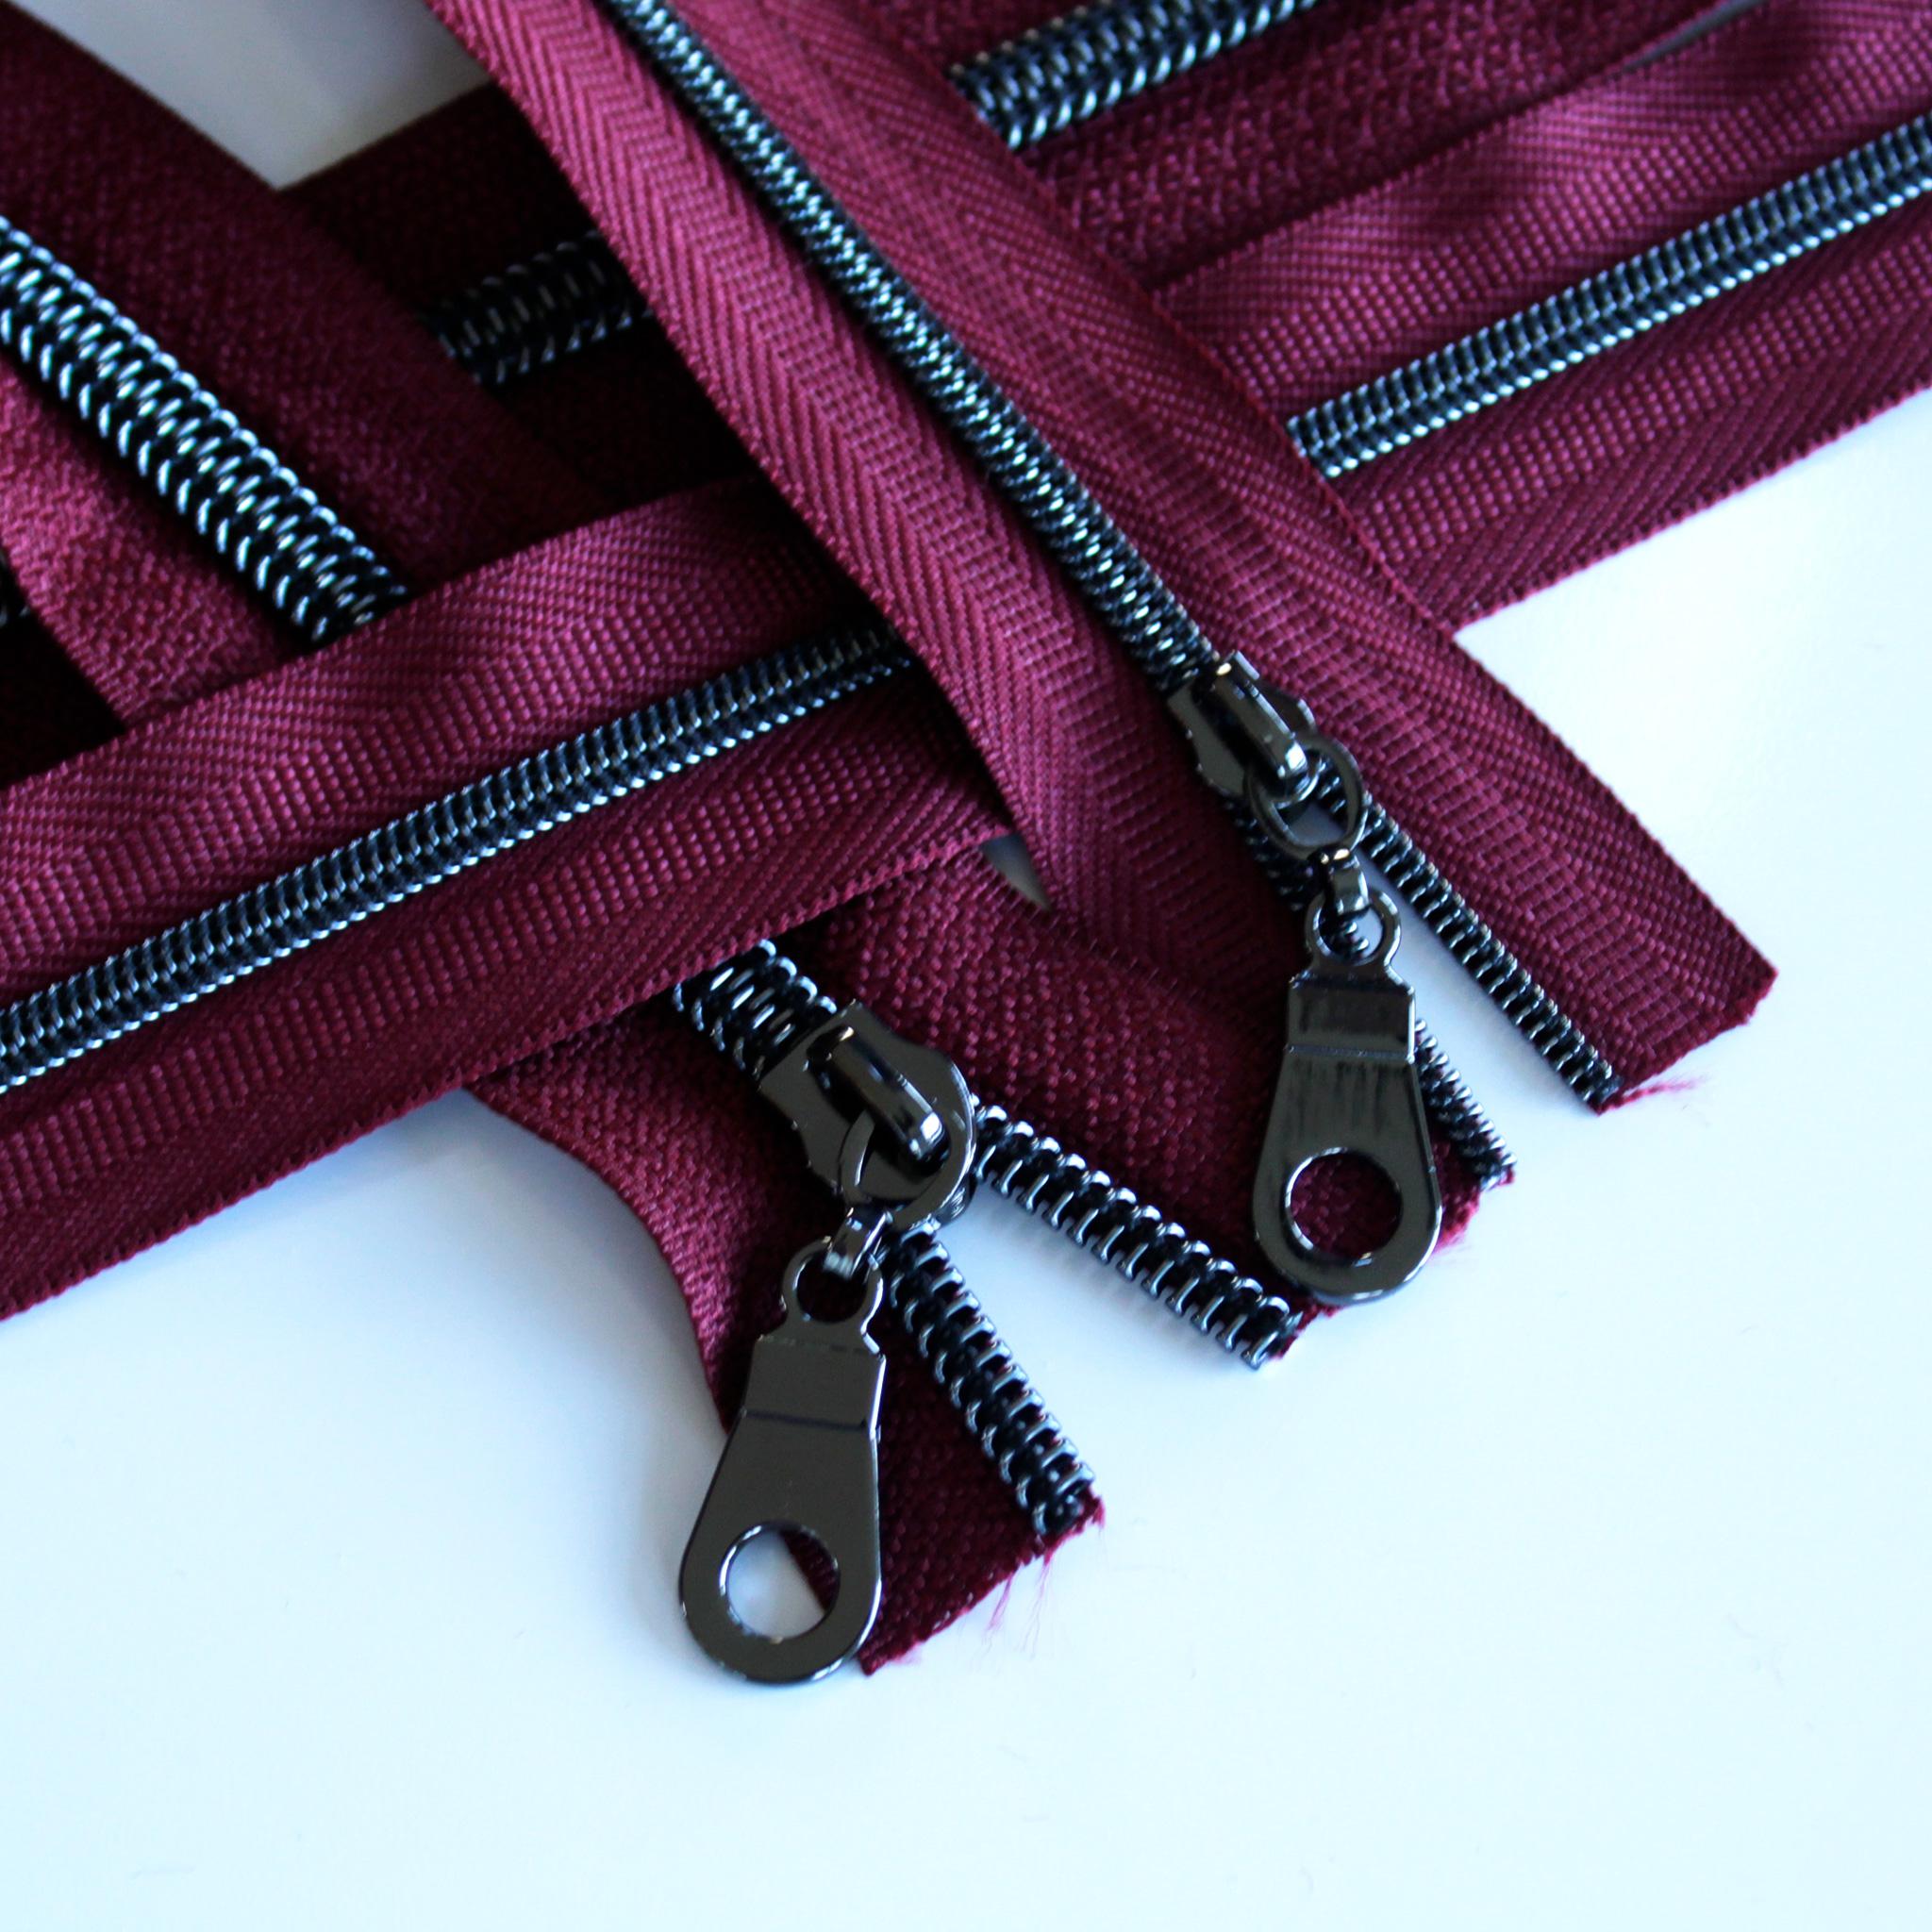 #5 Wine Zipper With Gunmetal Coil